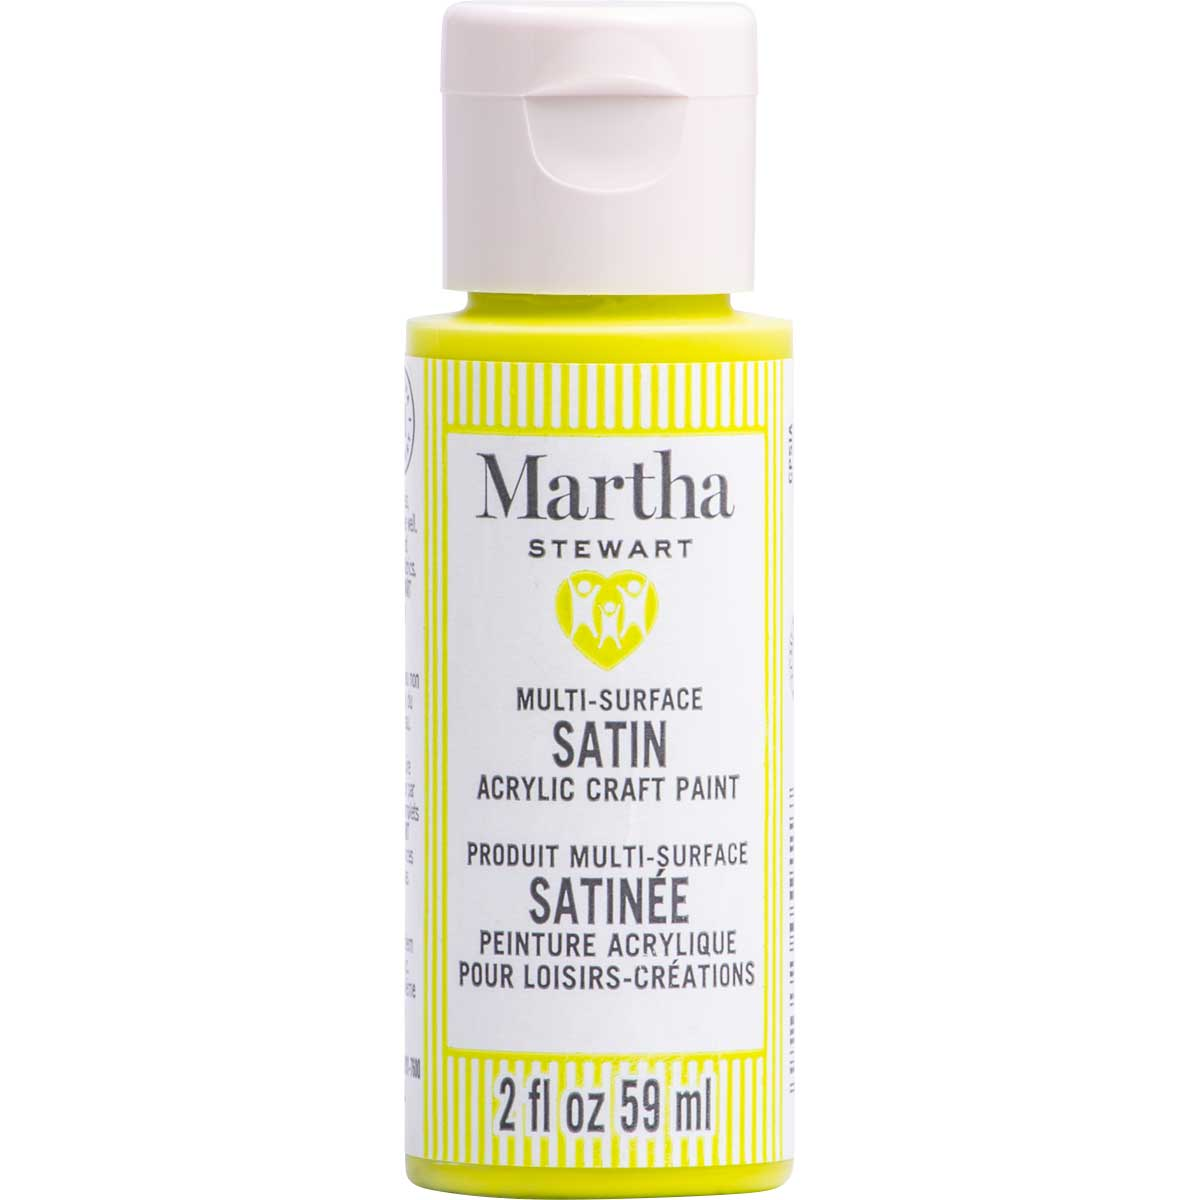 Martha Stewart ® Multi-Surface Satin Acrylic Craft Paint CPSIA - Caterpillar, 2 oz. - 5911